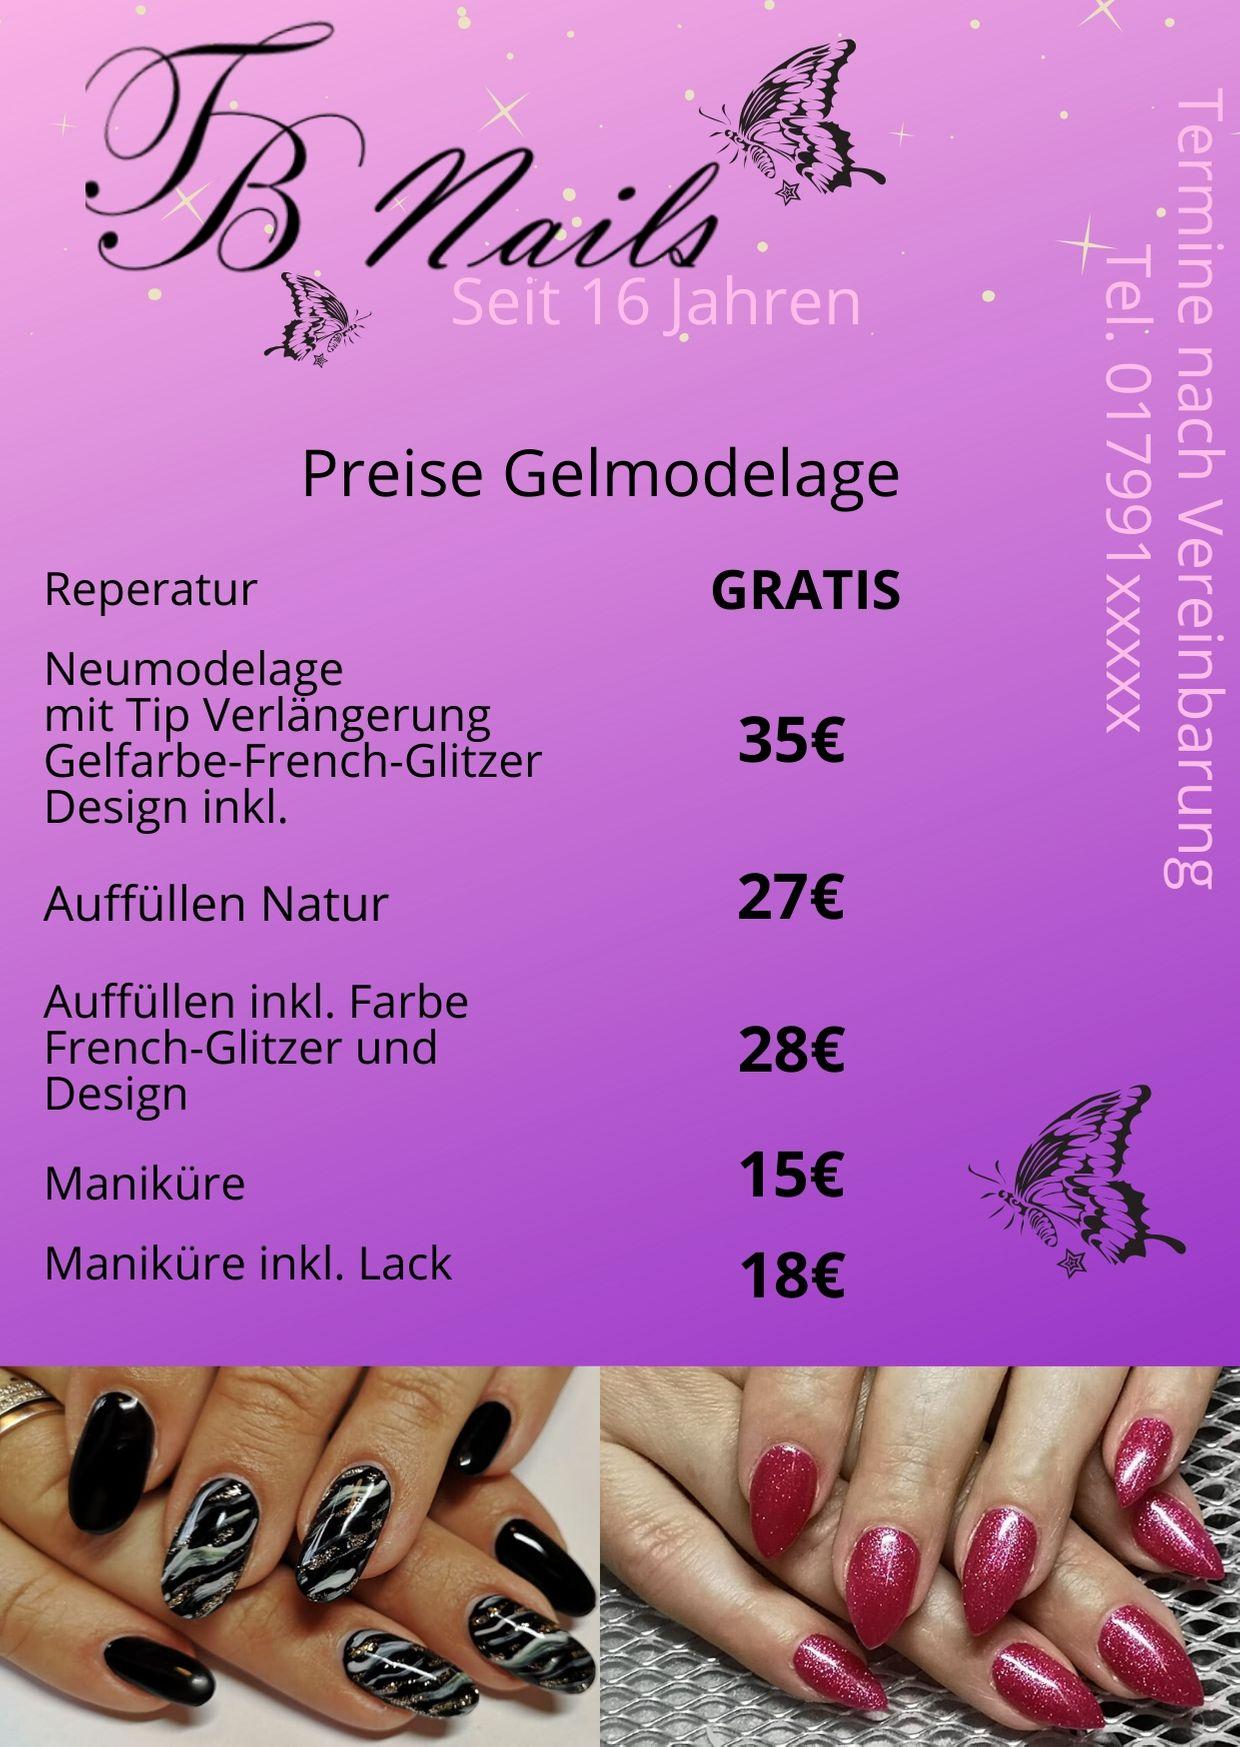 TB Nails